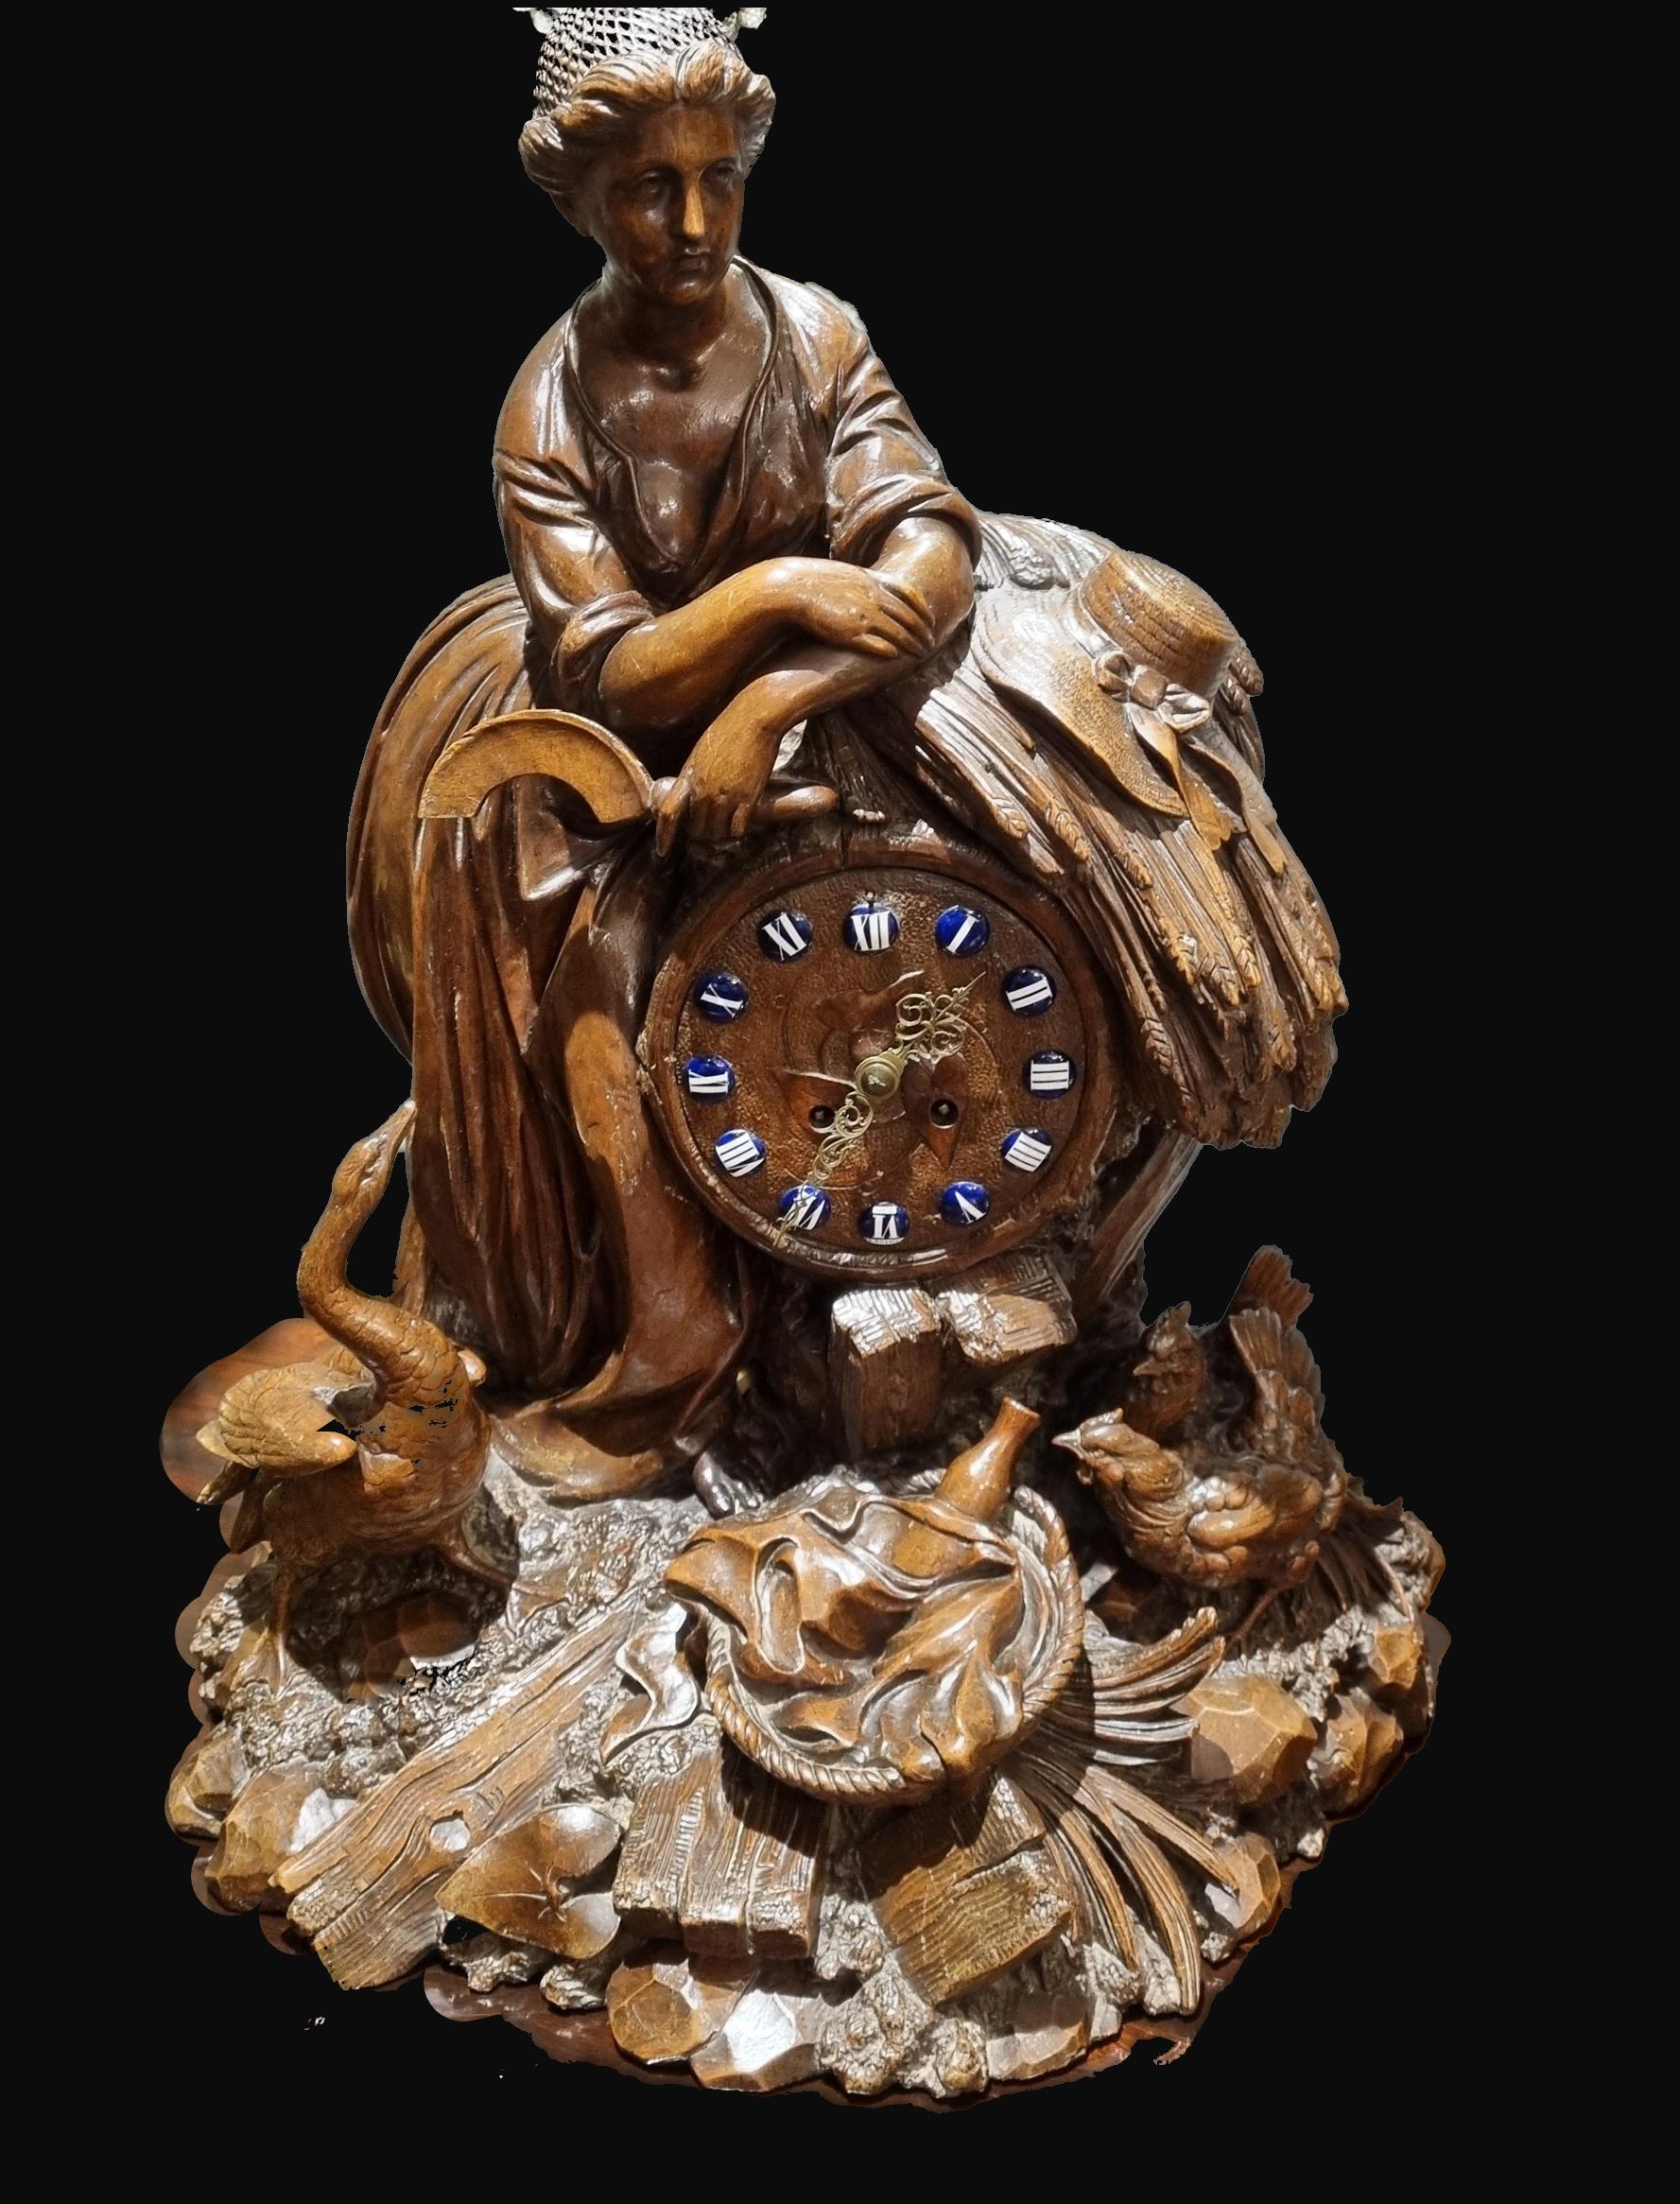 C19th Swiss Black forest Mantel Clock